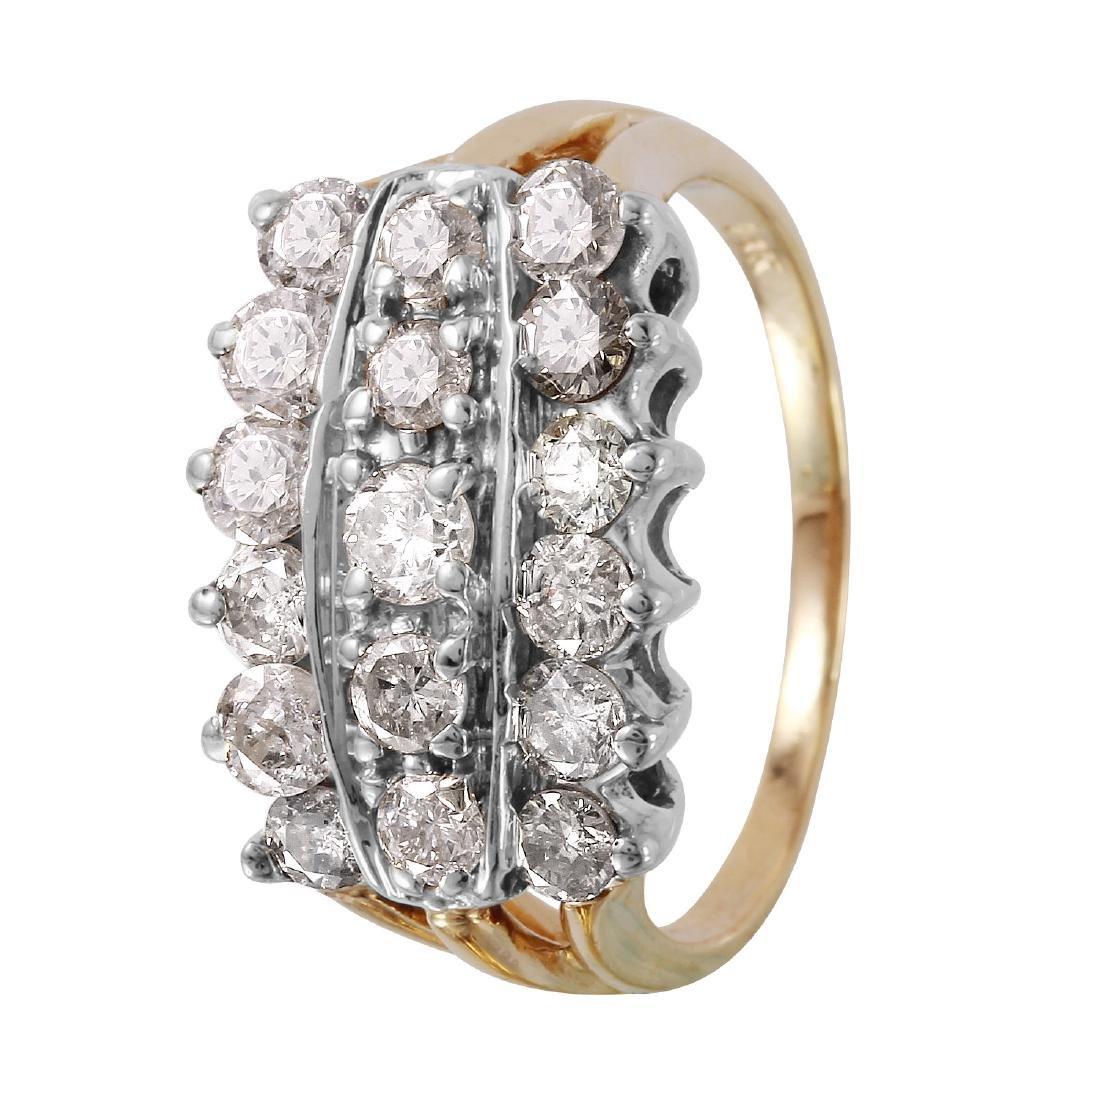 14KT Yellow Gold 1.50ctw Diamond Ring Size 8 L1177